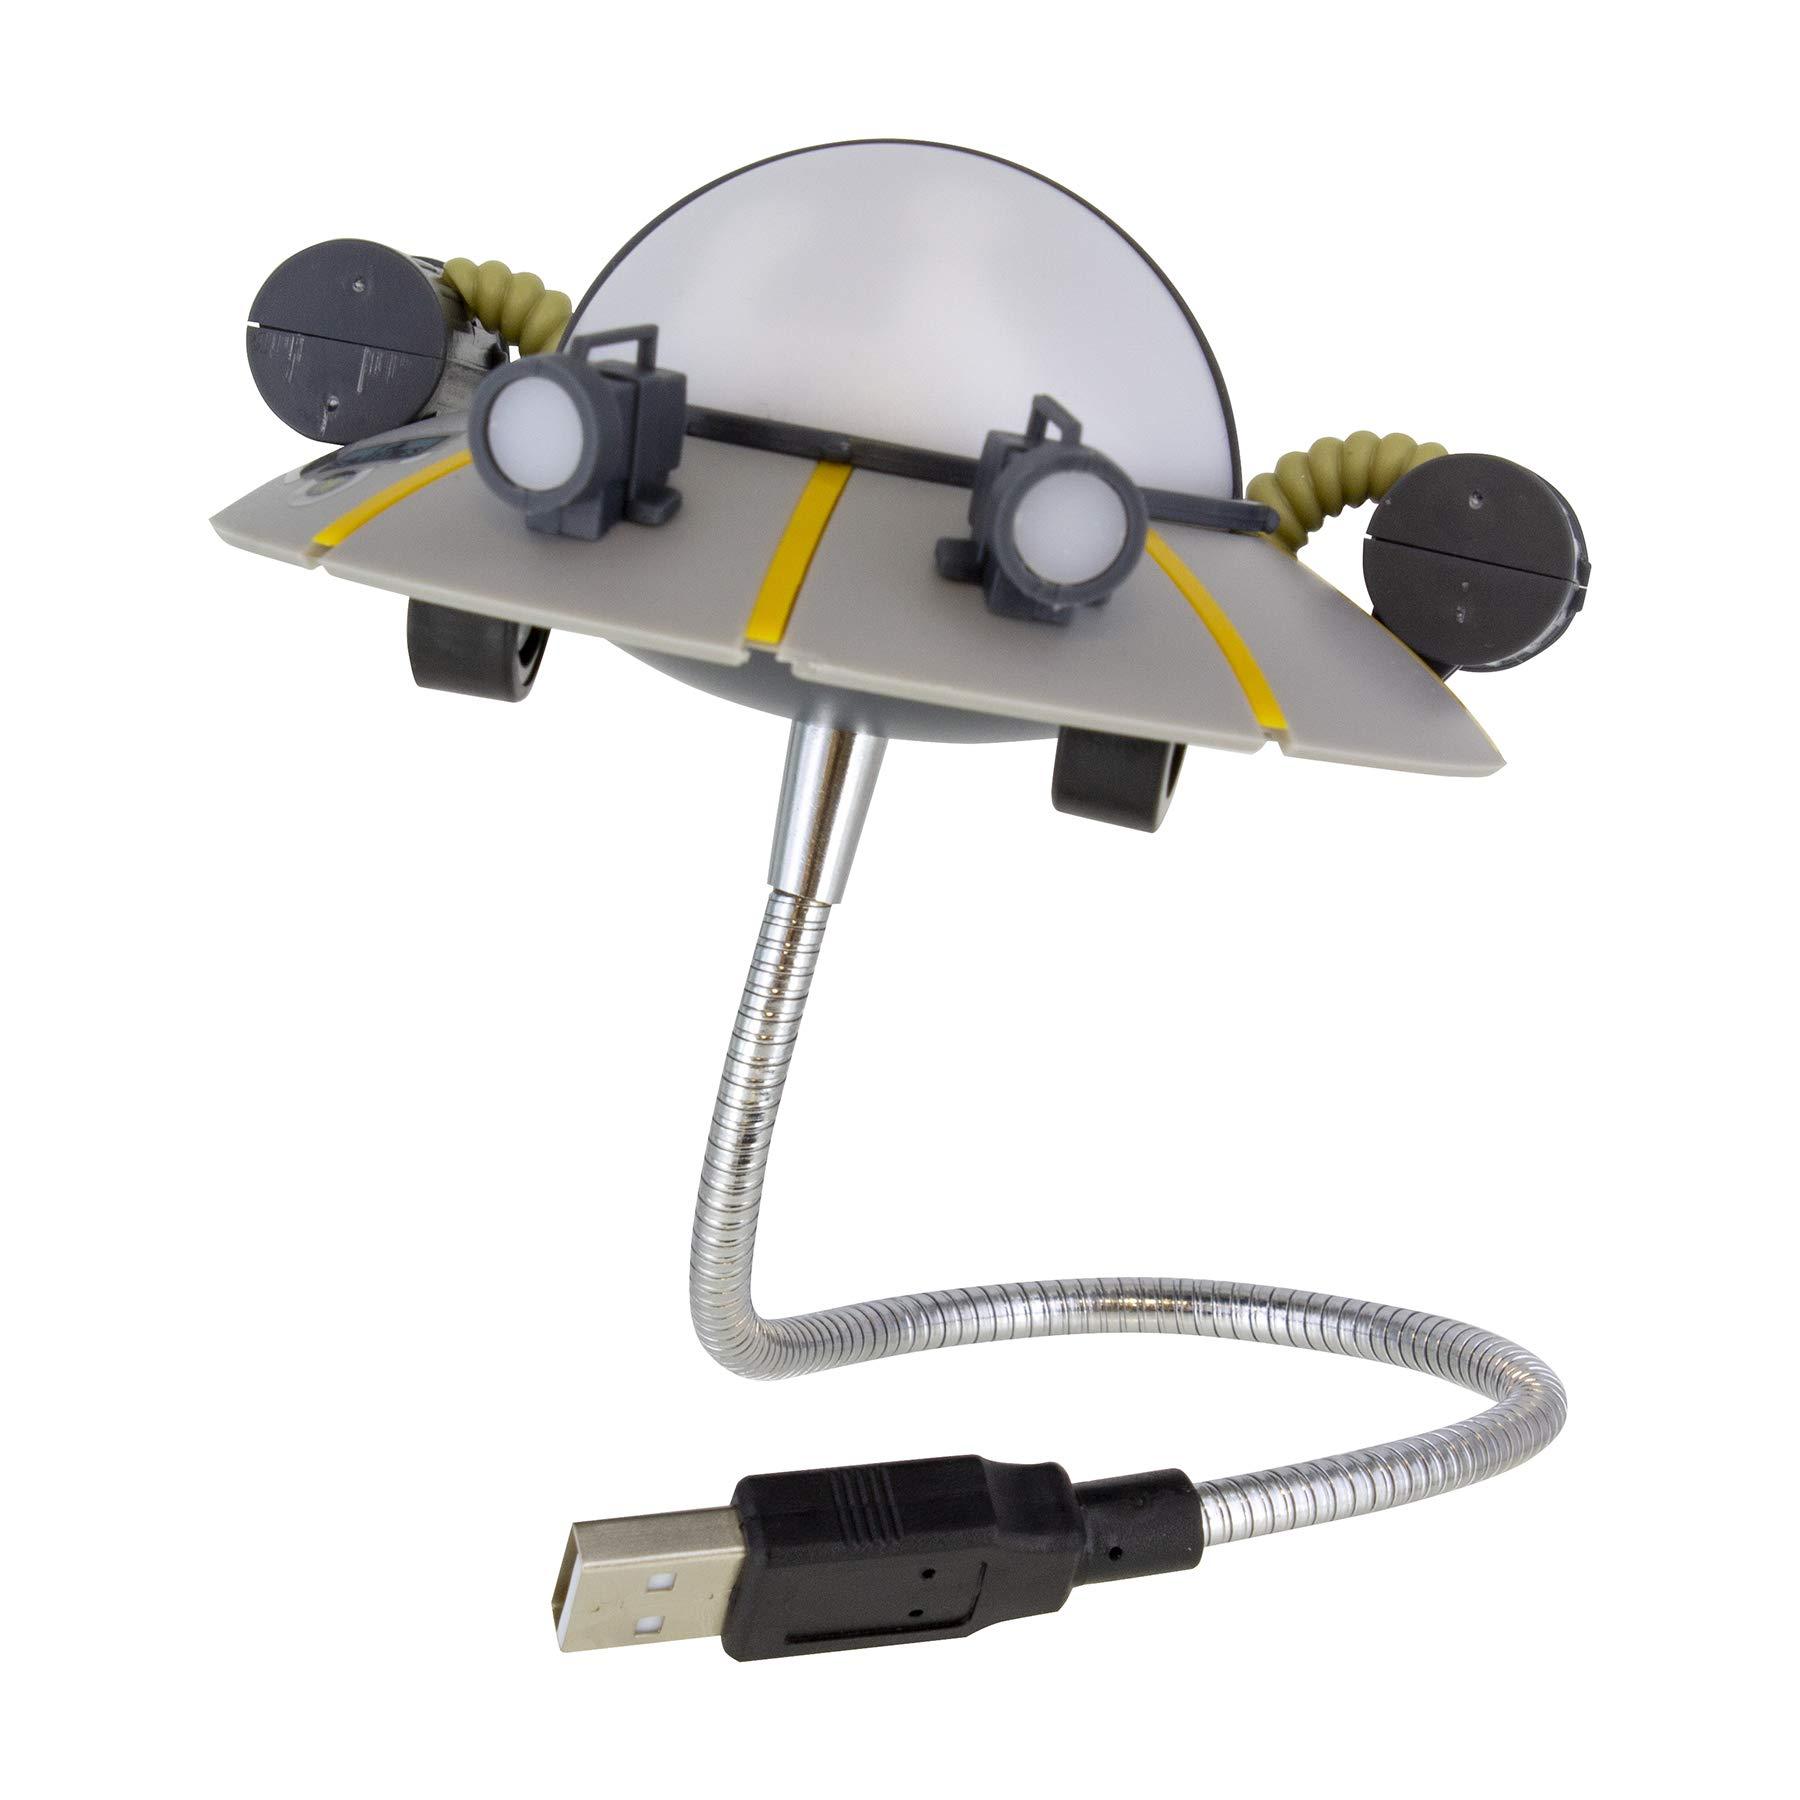 Rick & Morty - Ricks Space Ship USB Light by Paladone